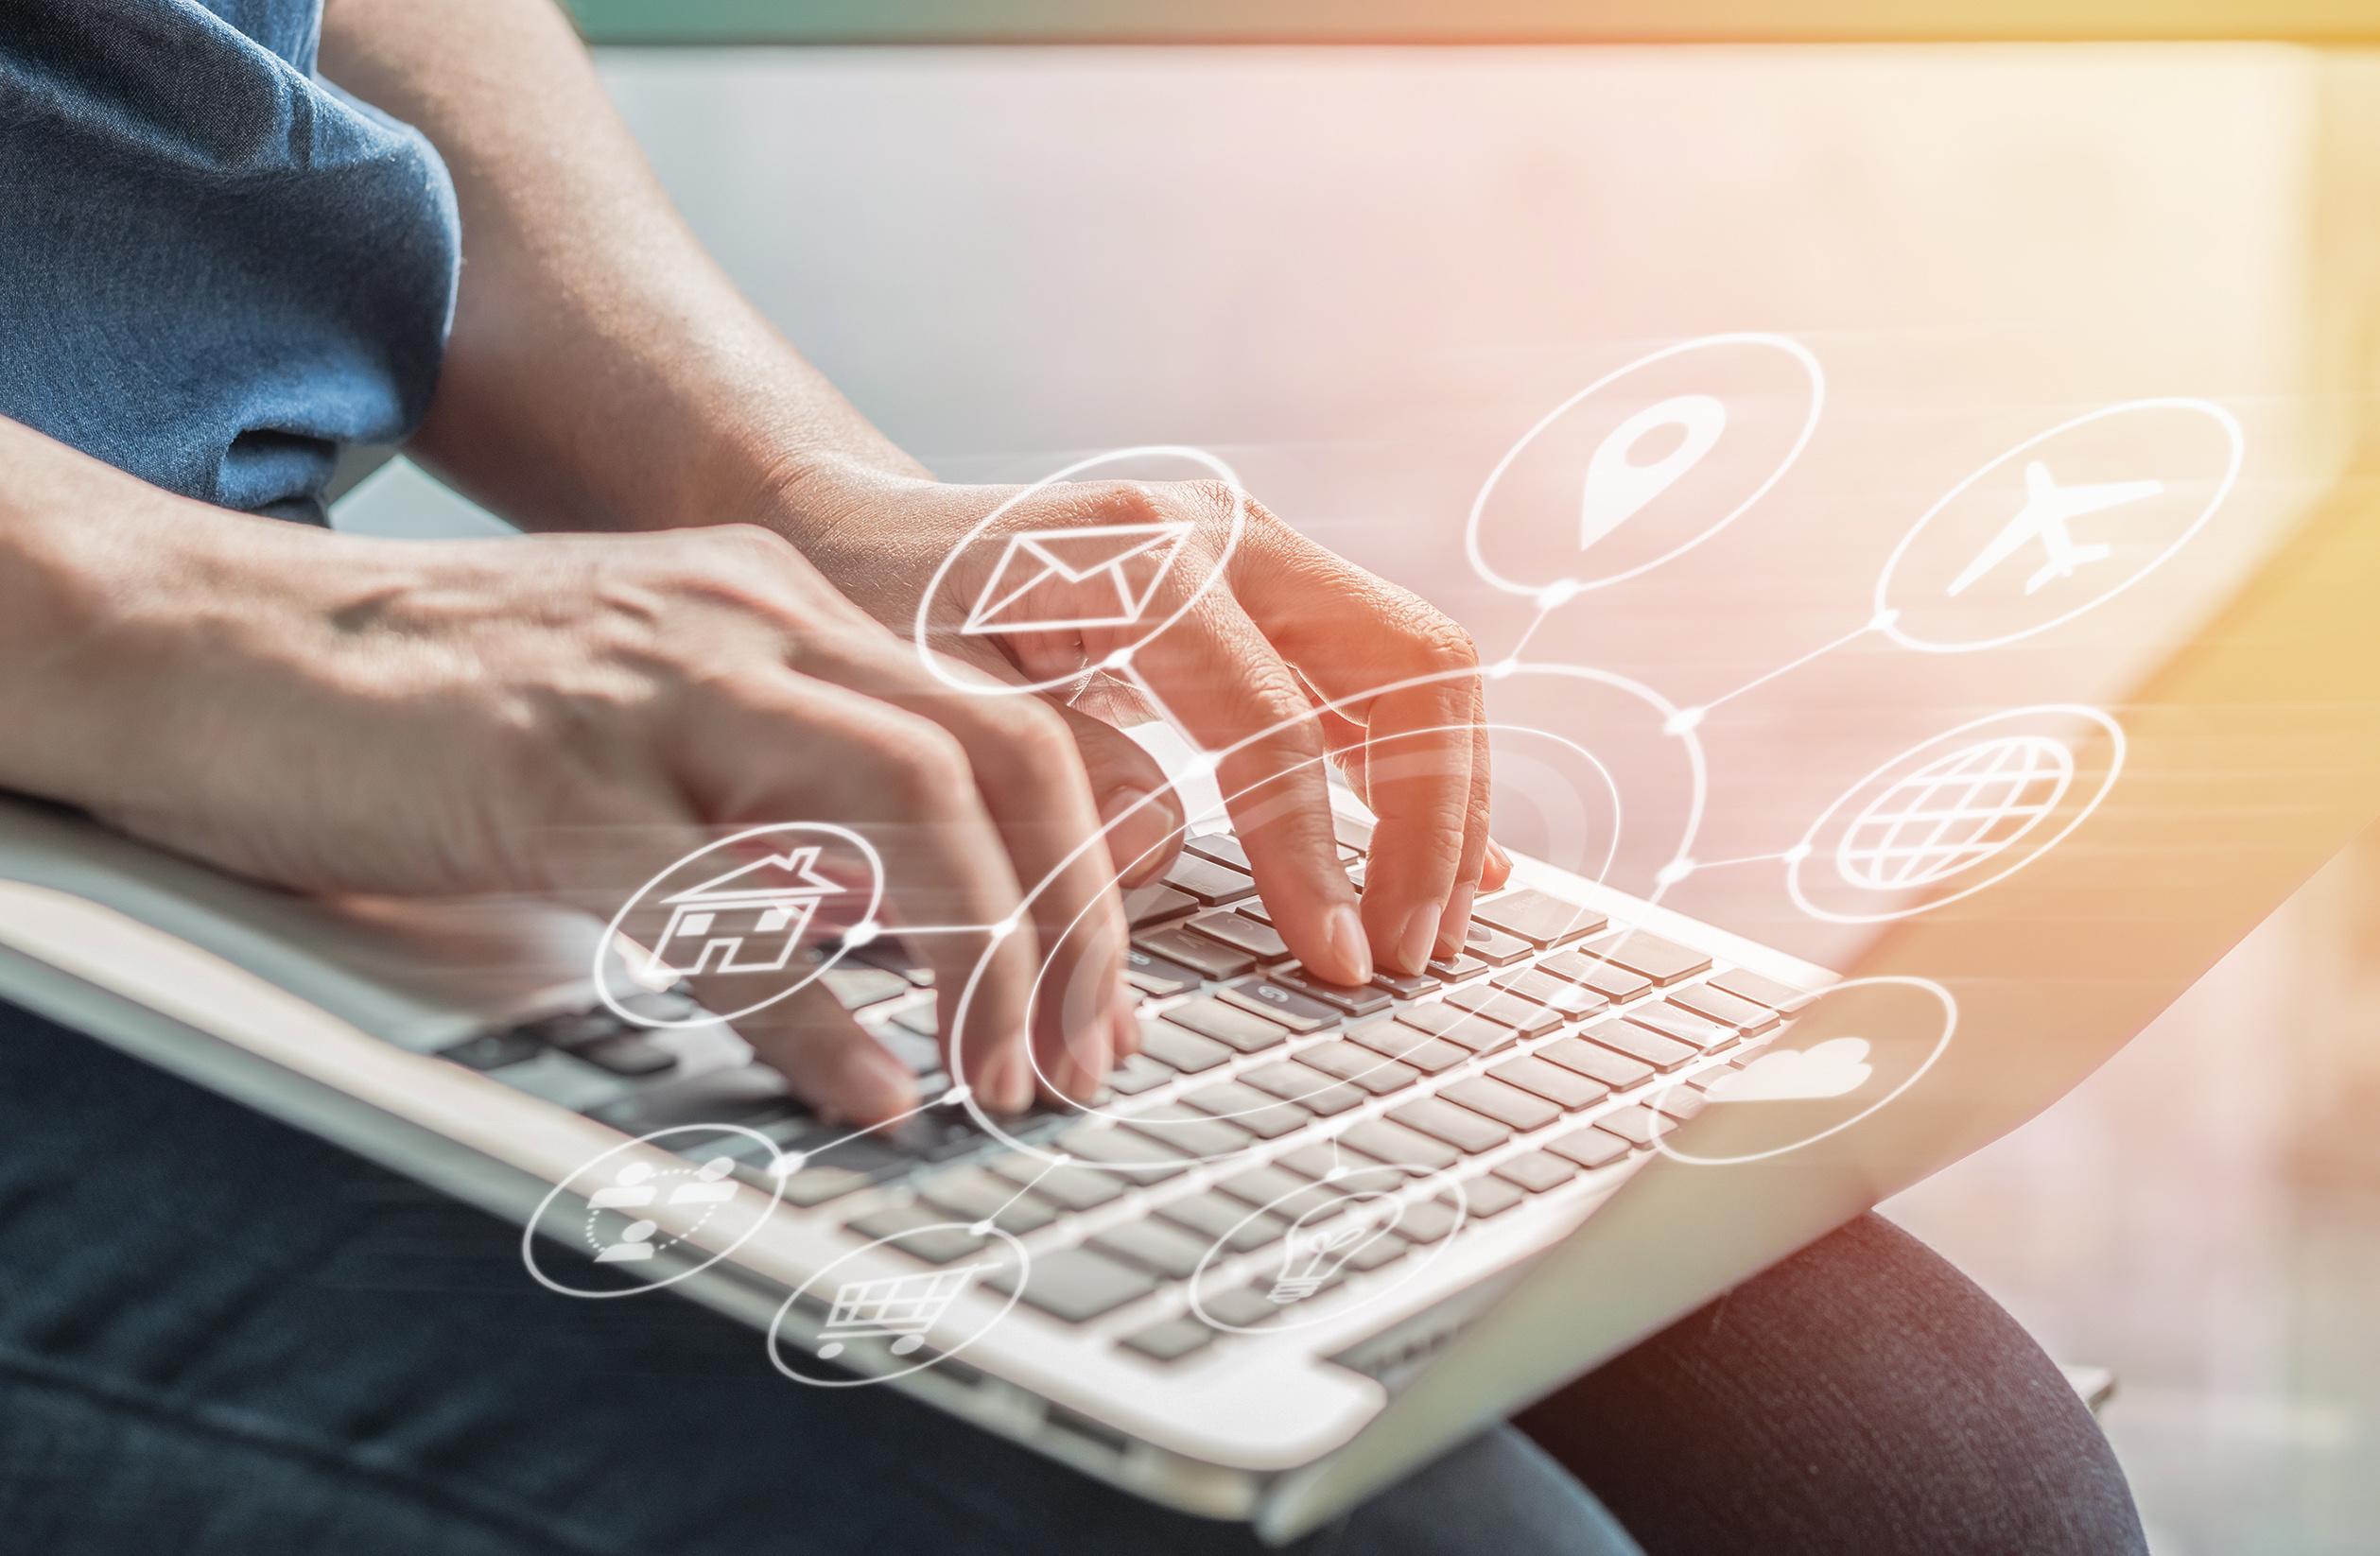 Internet of things – IOT on smart device mobile app technology via digital communication technology service